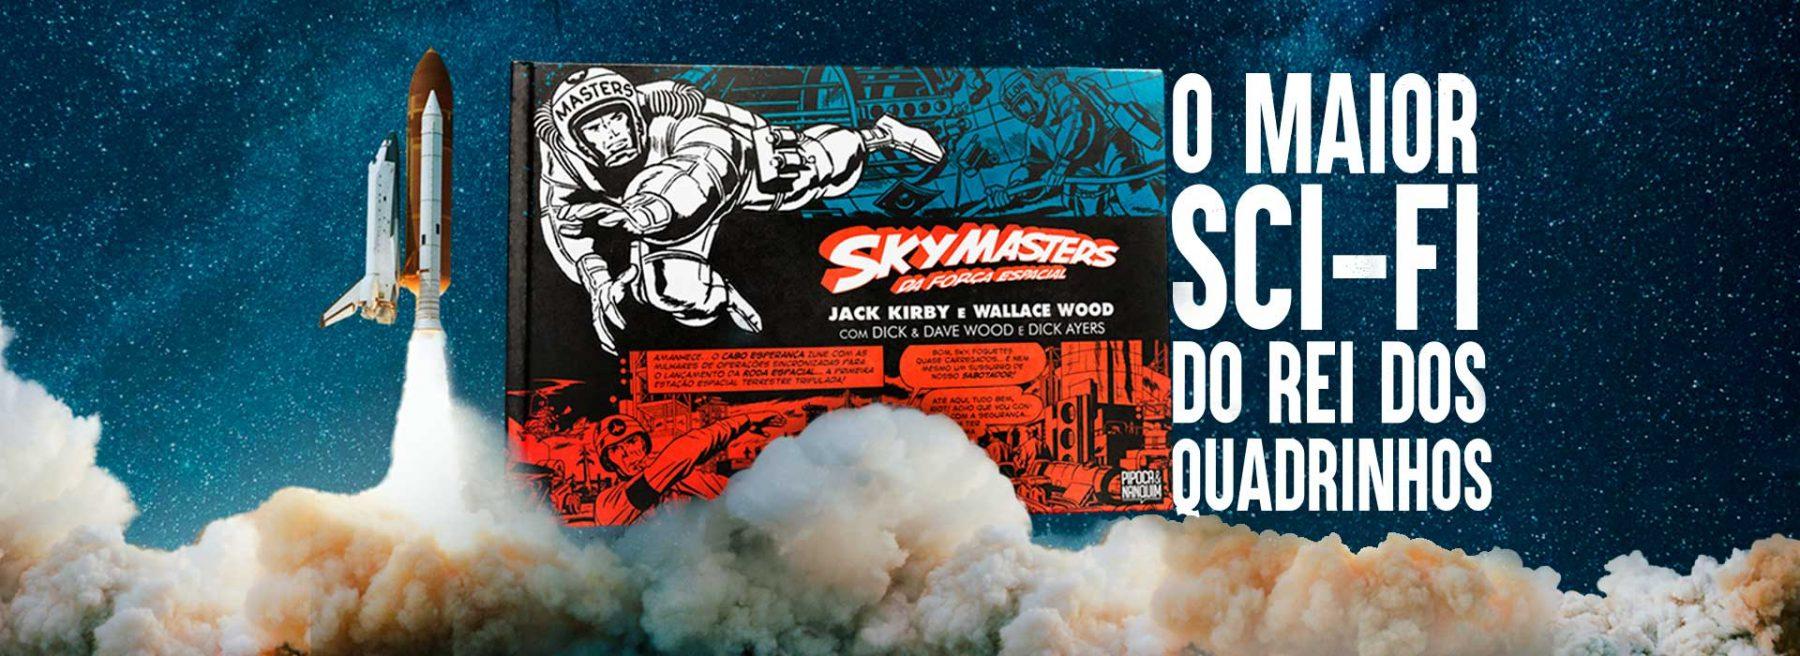 skymasters slide